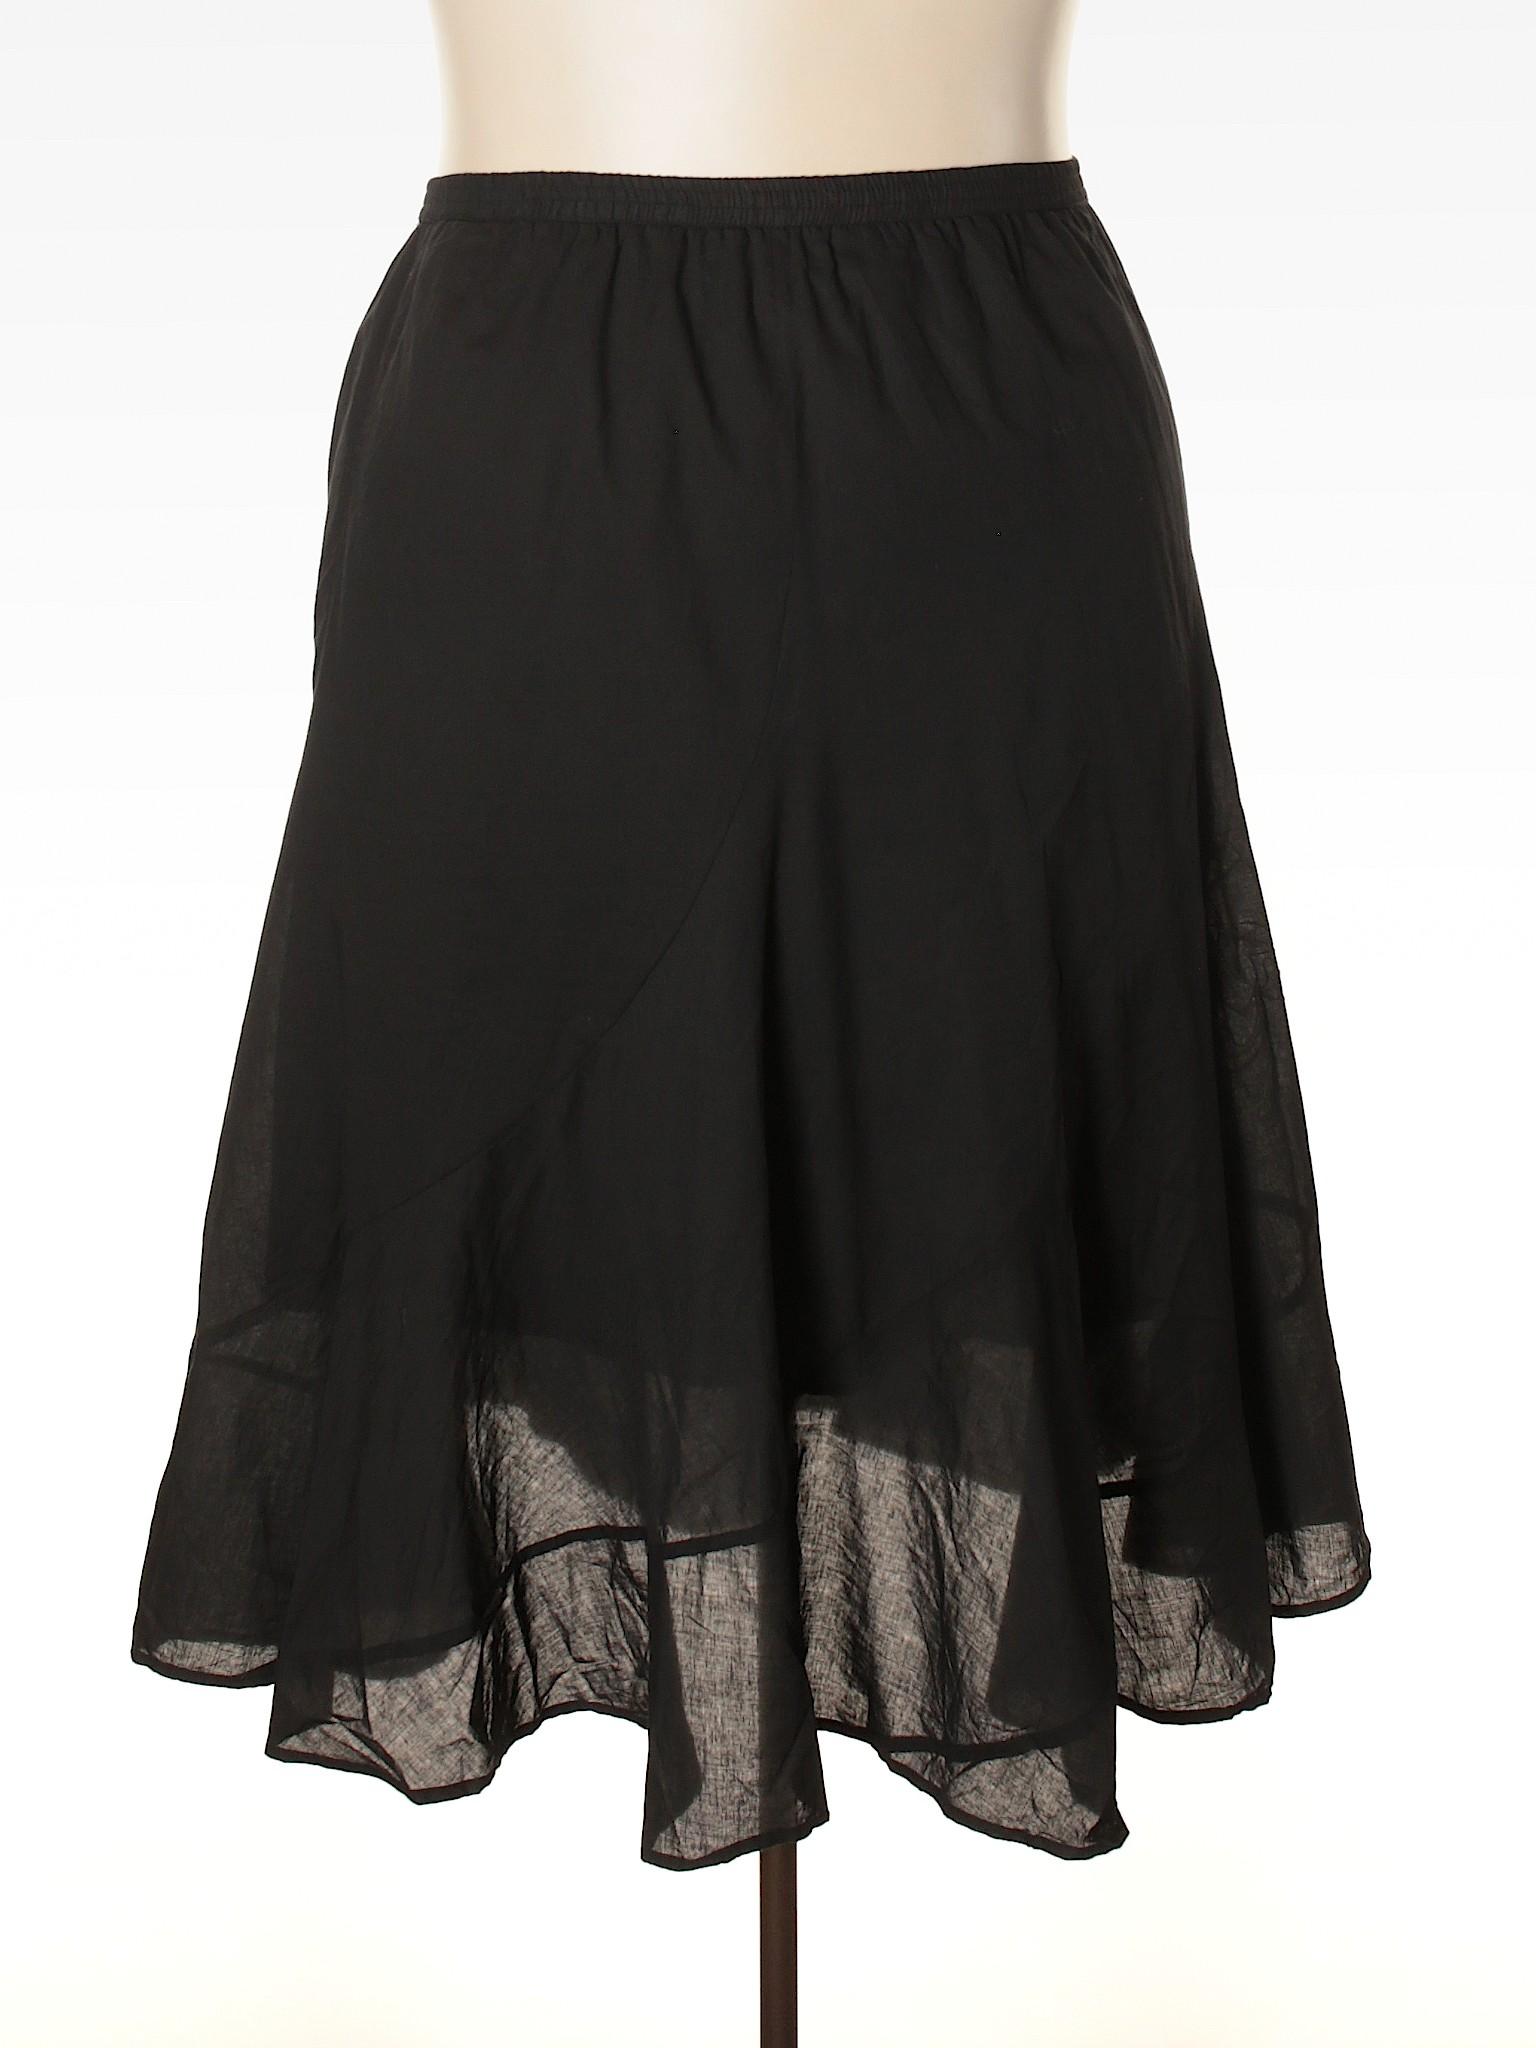 Boutique Casual Casual Boutique Boutique Casual Boutique Boutique Skirt Skirt Casual Casual Skirt Skirt rrgRZwq